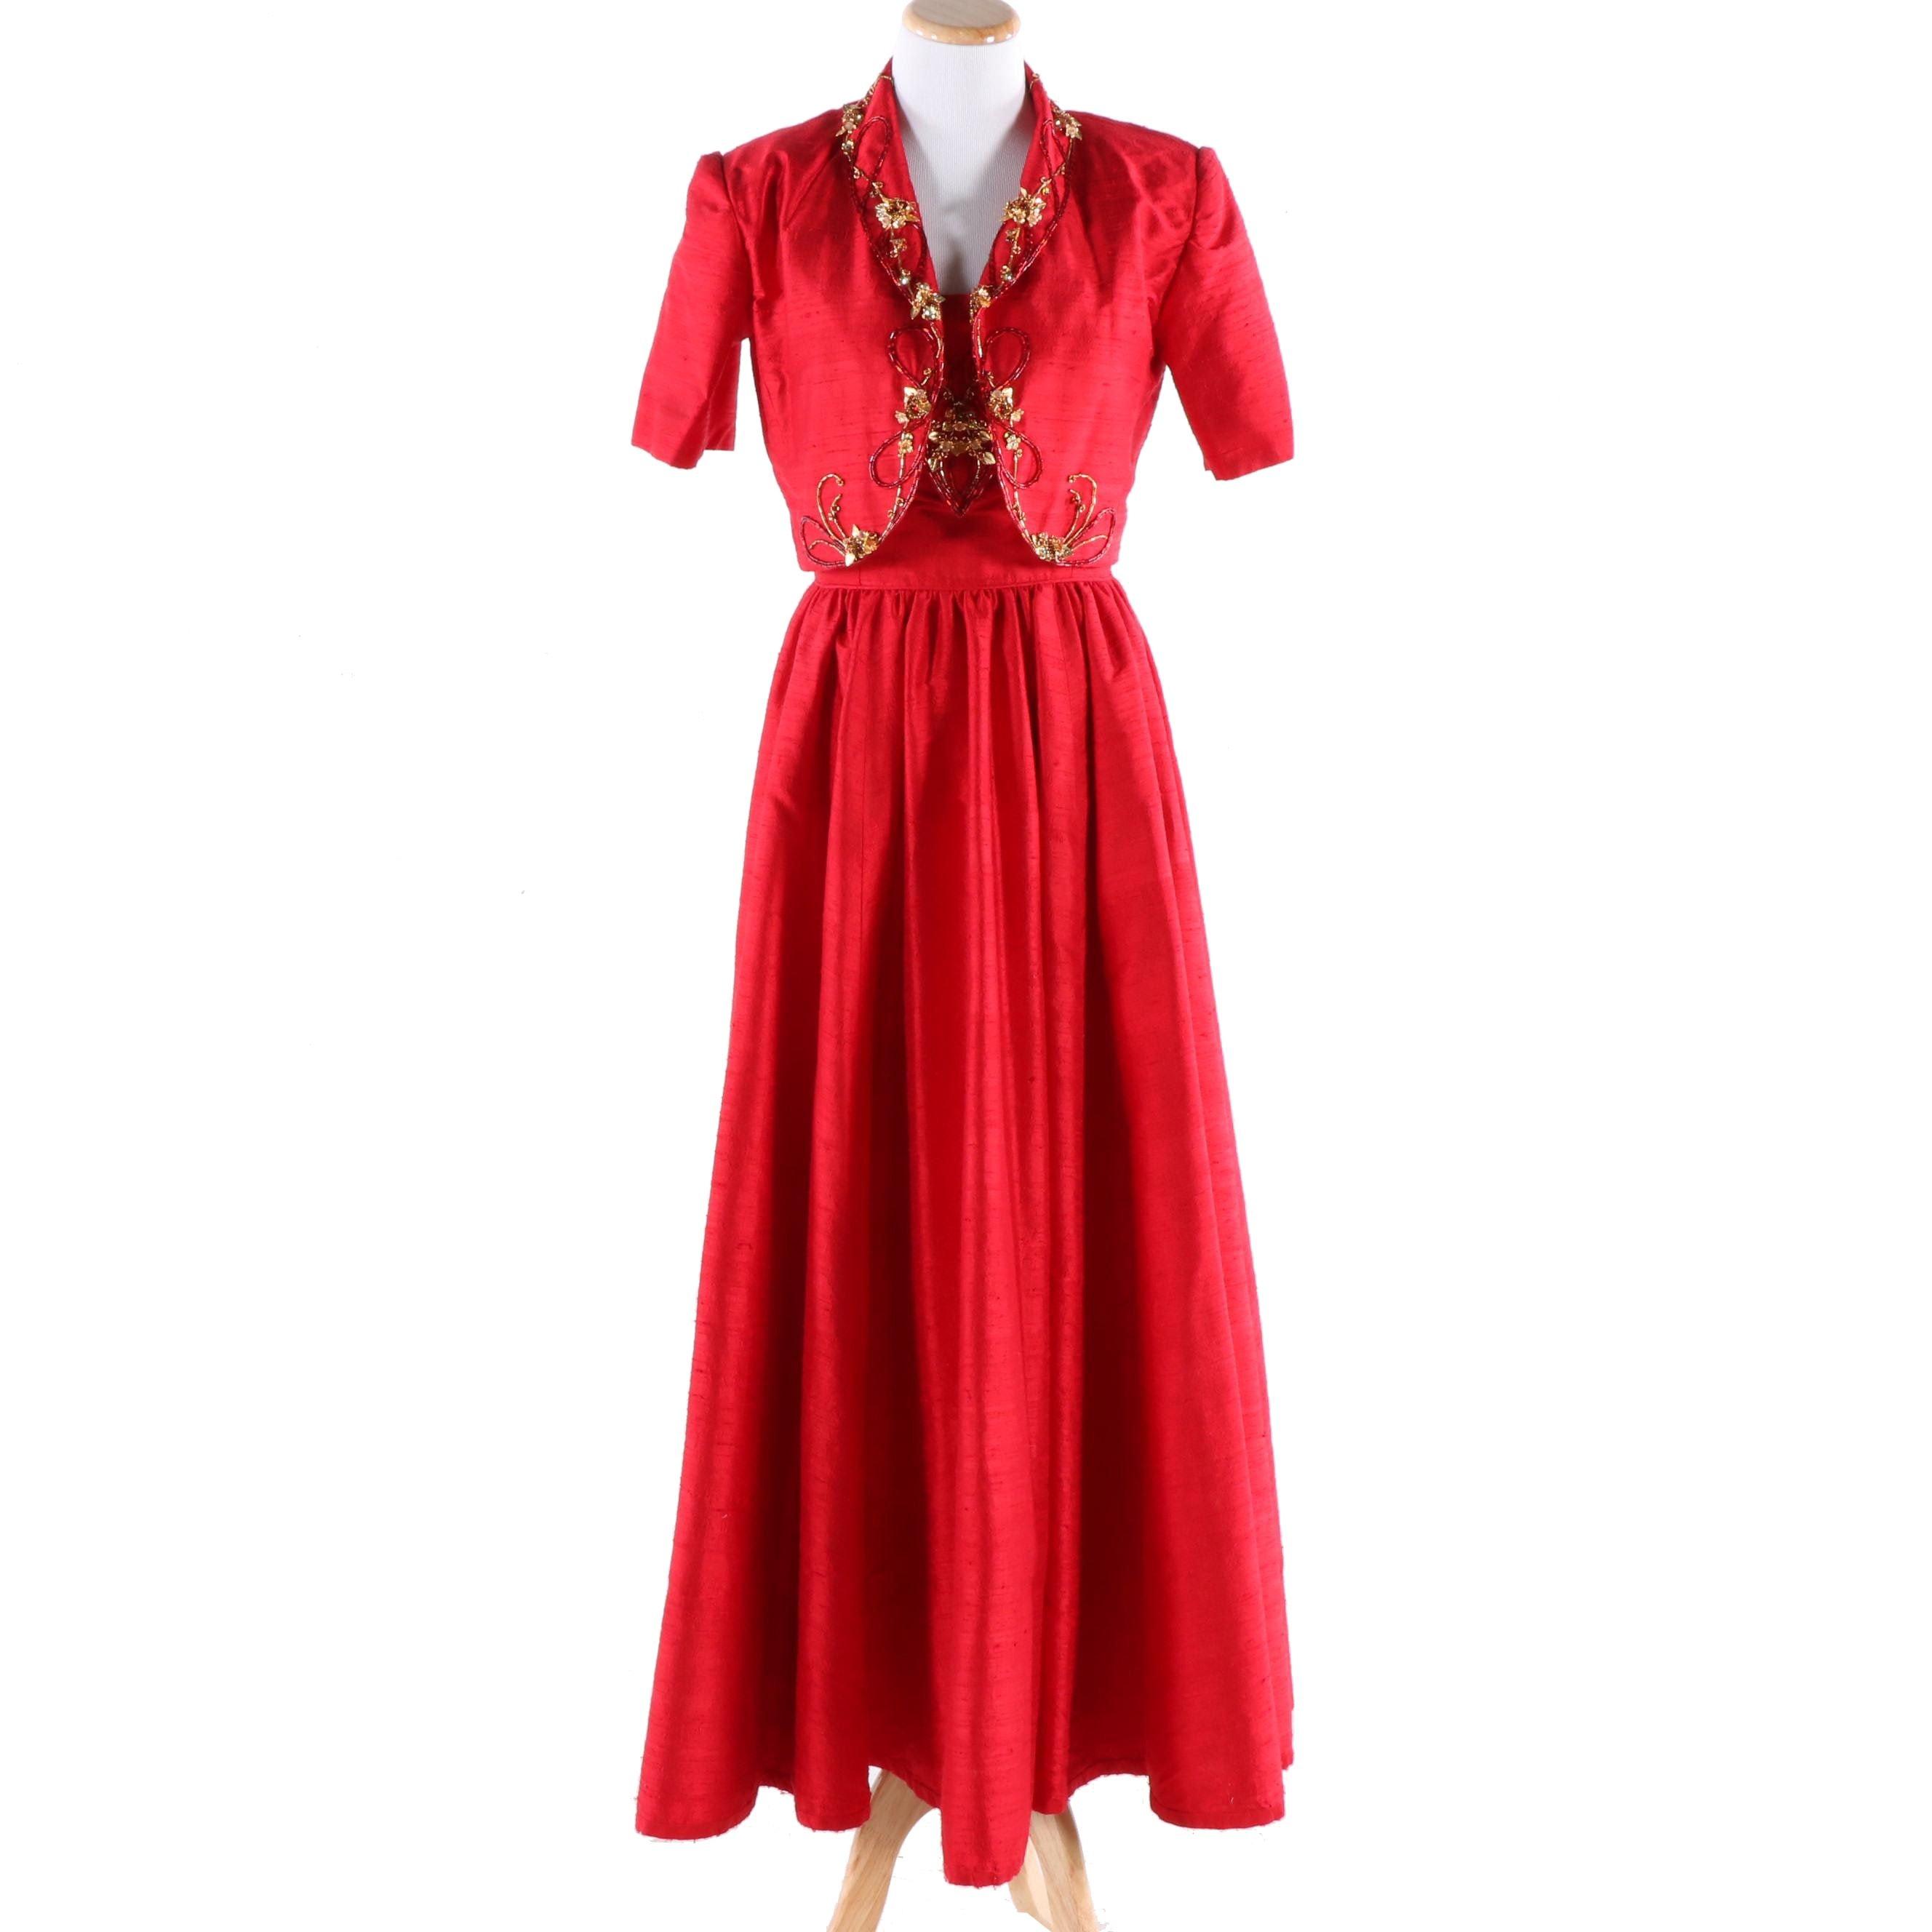 Red Silk Dupioni Beaded Evening Gown With Bolero Jacket